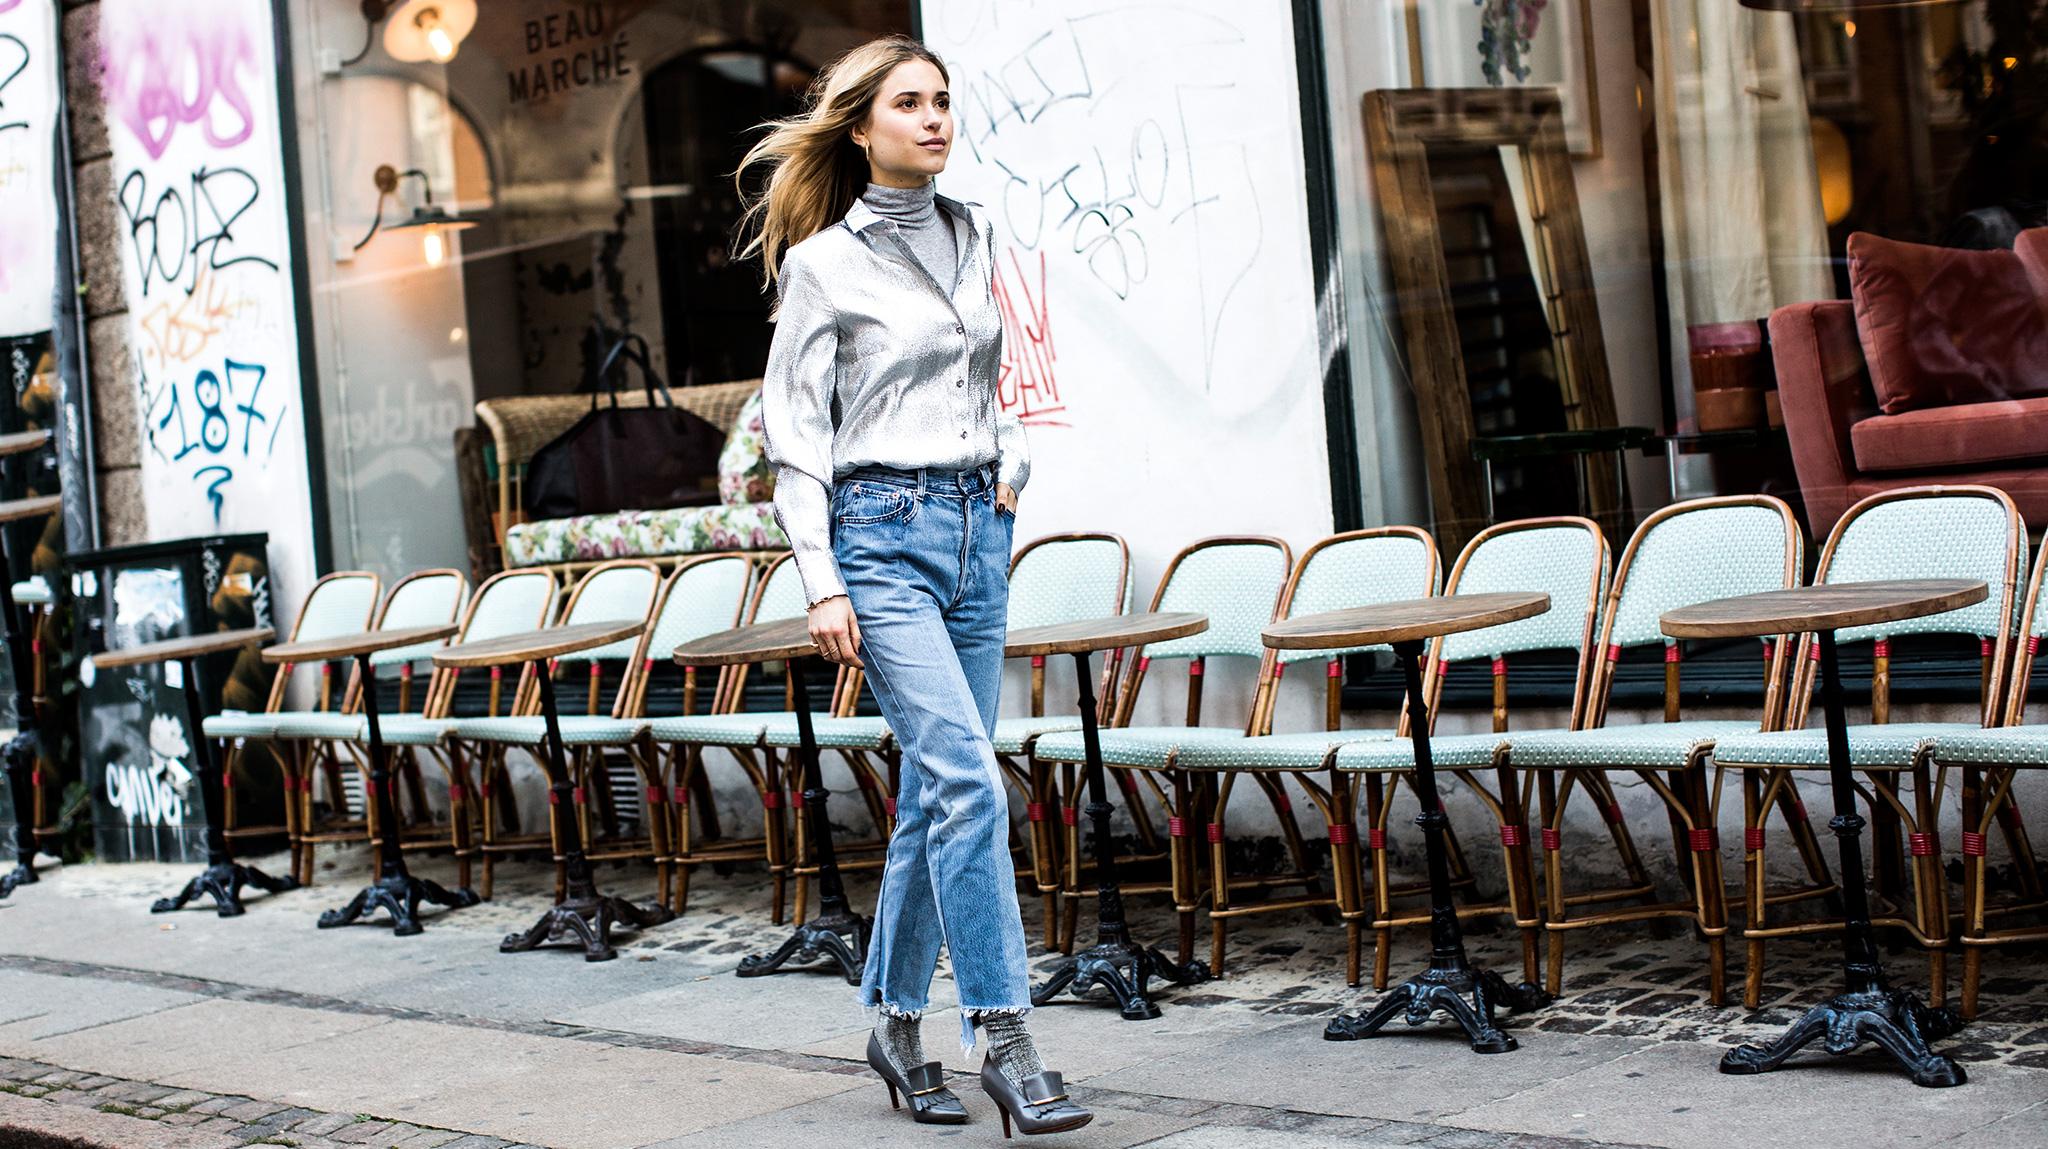 pernille teisbaek street outfits envy